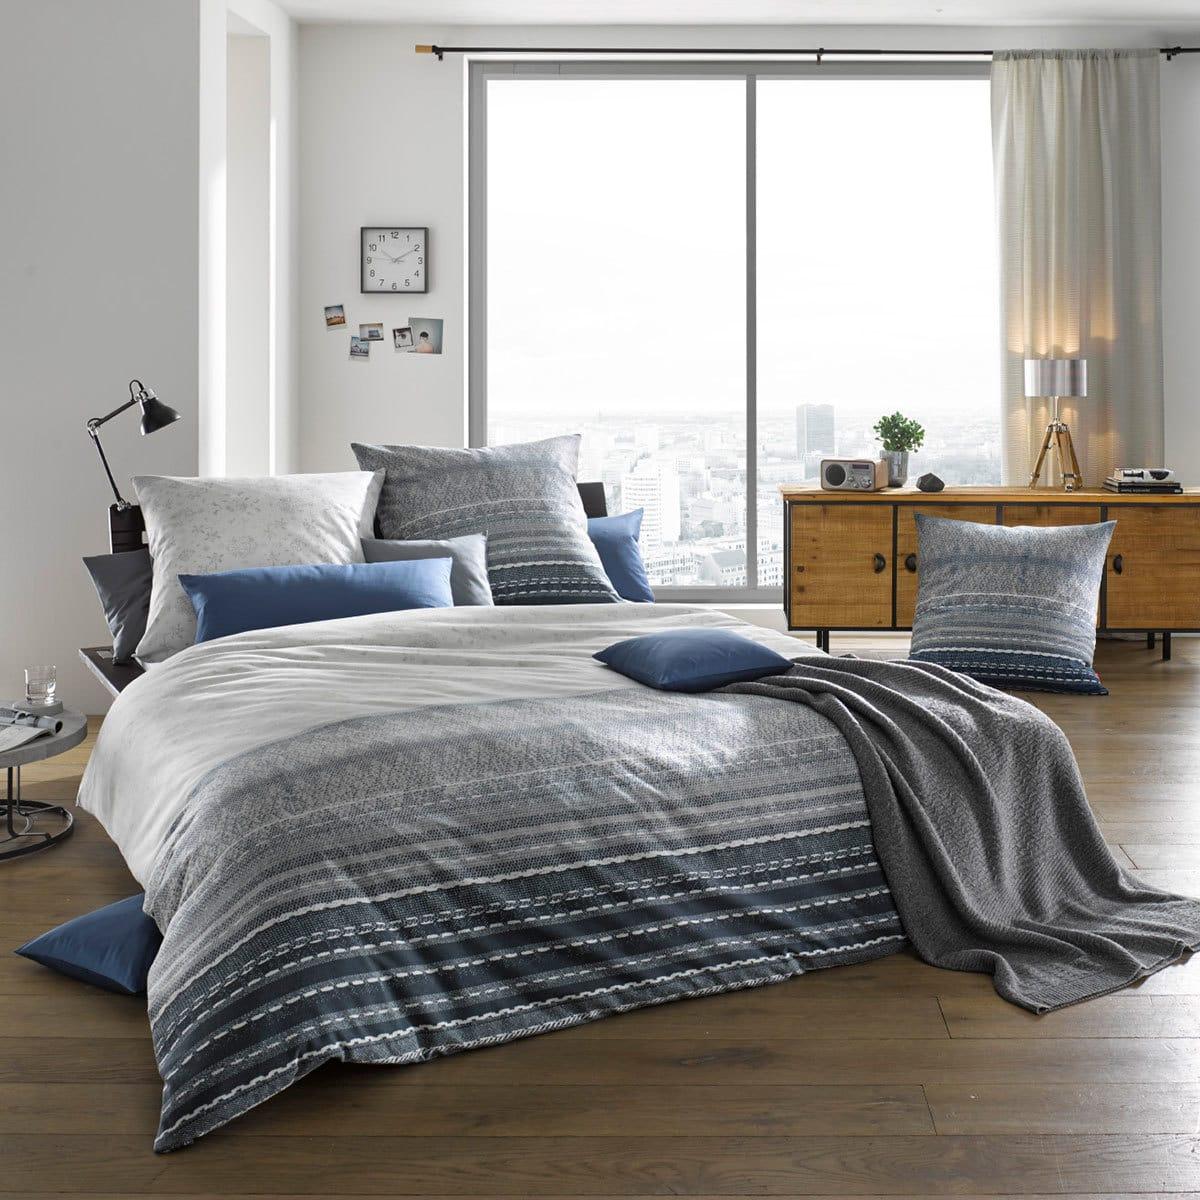 fleuresse feinbiber bettw sche aspen 433820 dark denim g nstig online kaufen bei bettwaren shop. Black Bedroom Furniture Sets. Home Design Ideas